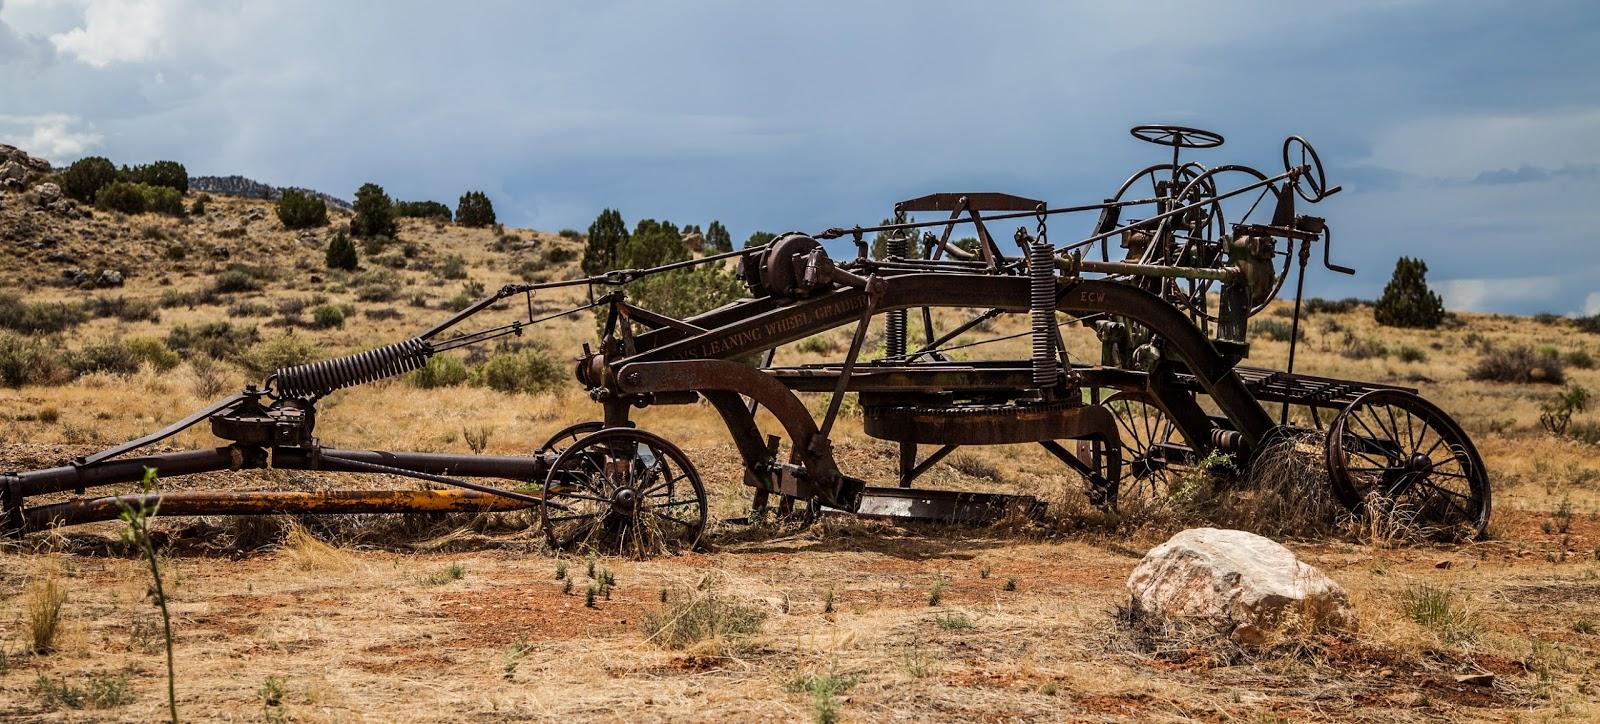 Walking Arizona: The Old Caterpillar Road Grader